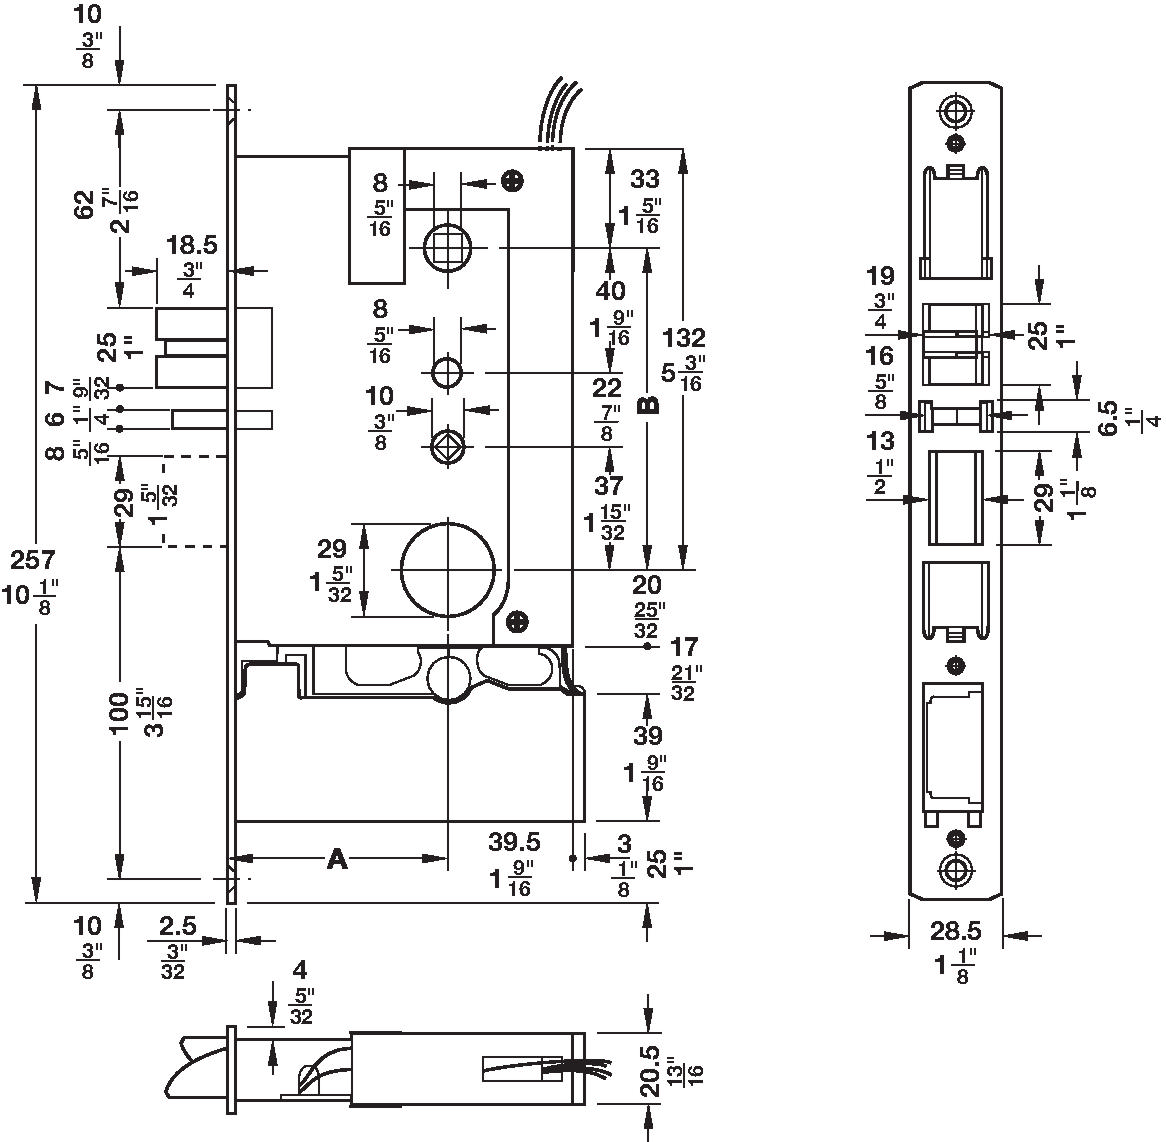 mortise lock parts diagram dyson dc25 animal bing images